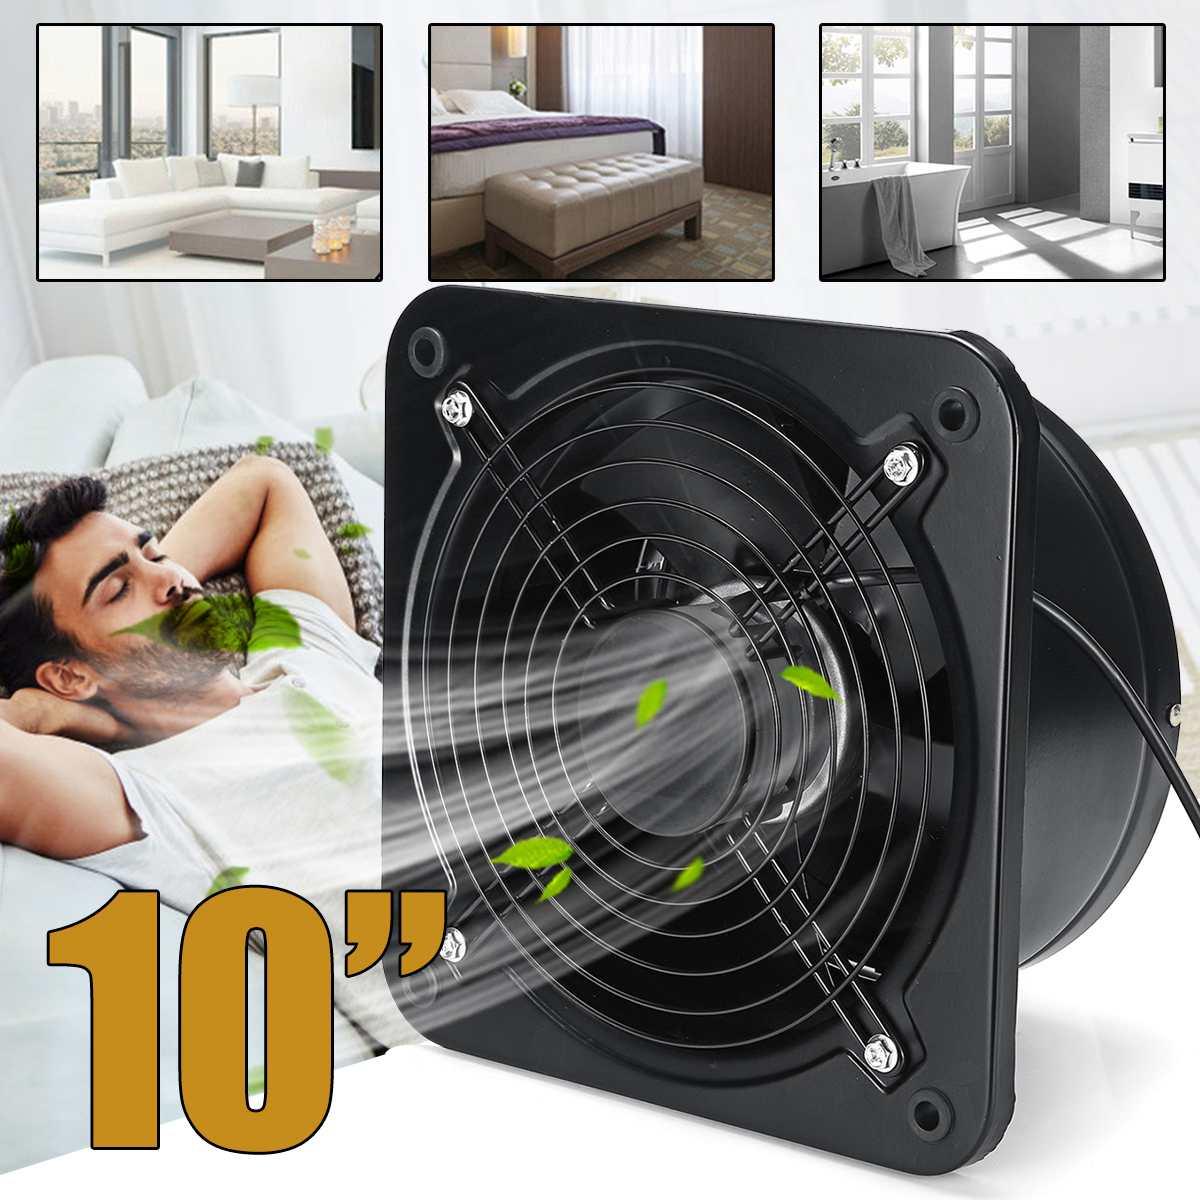 125W 10 Wall Window Extractor Ventilation Fan 220V Silent Bathroom Kitchen Toilet High Speed Ventilator Industrial Exhaust Fan